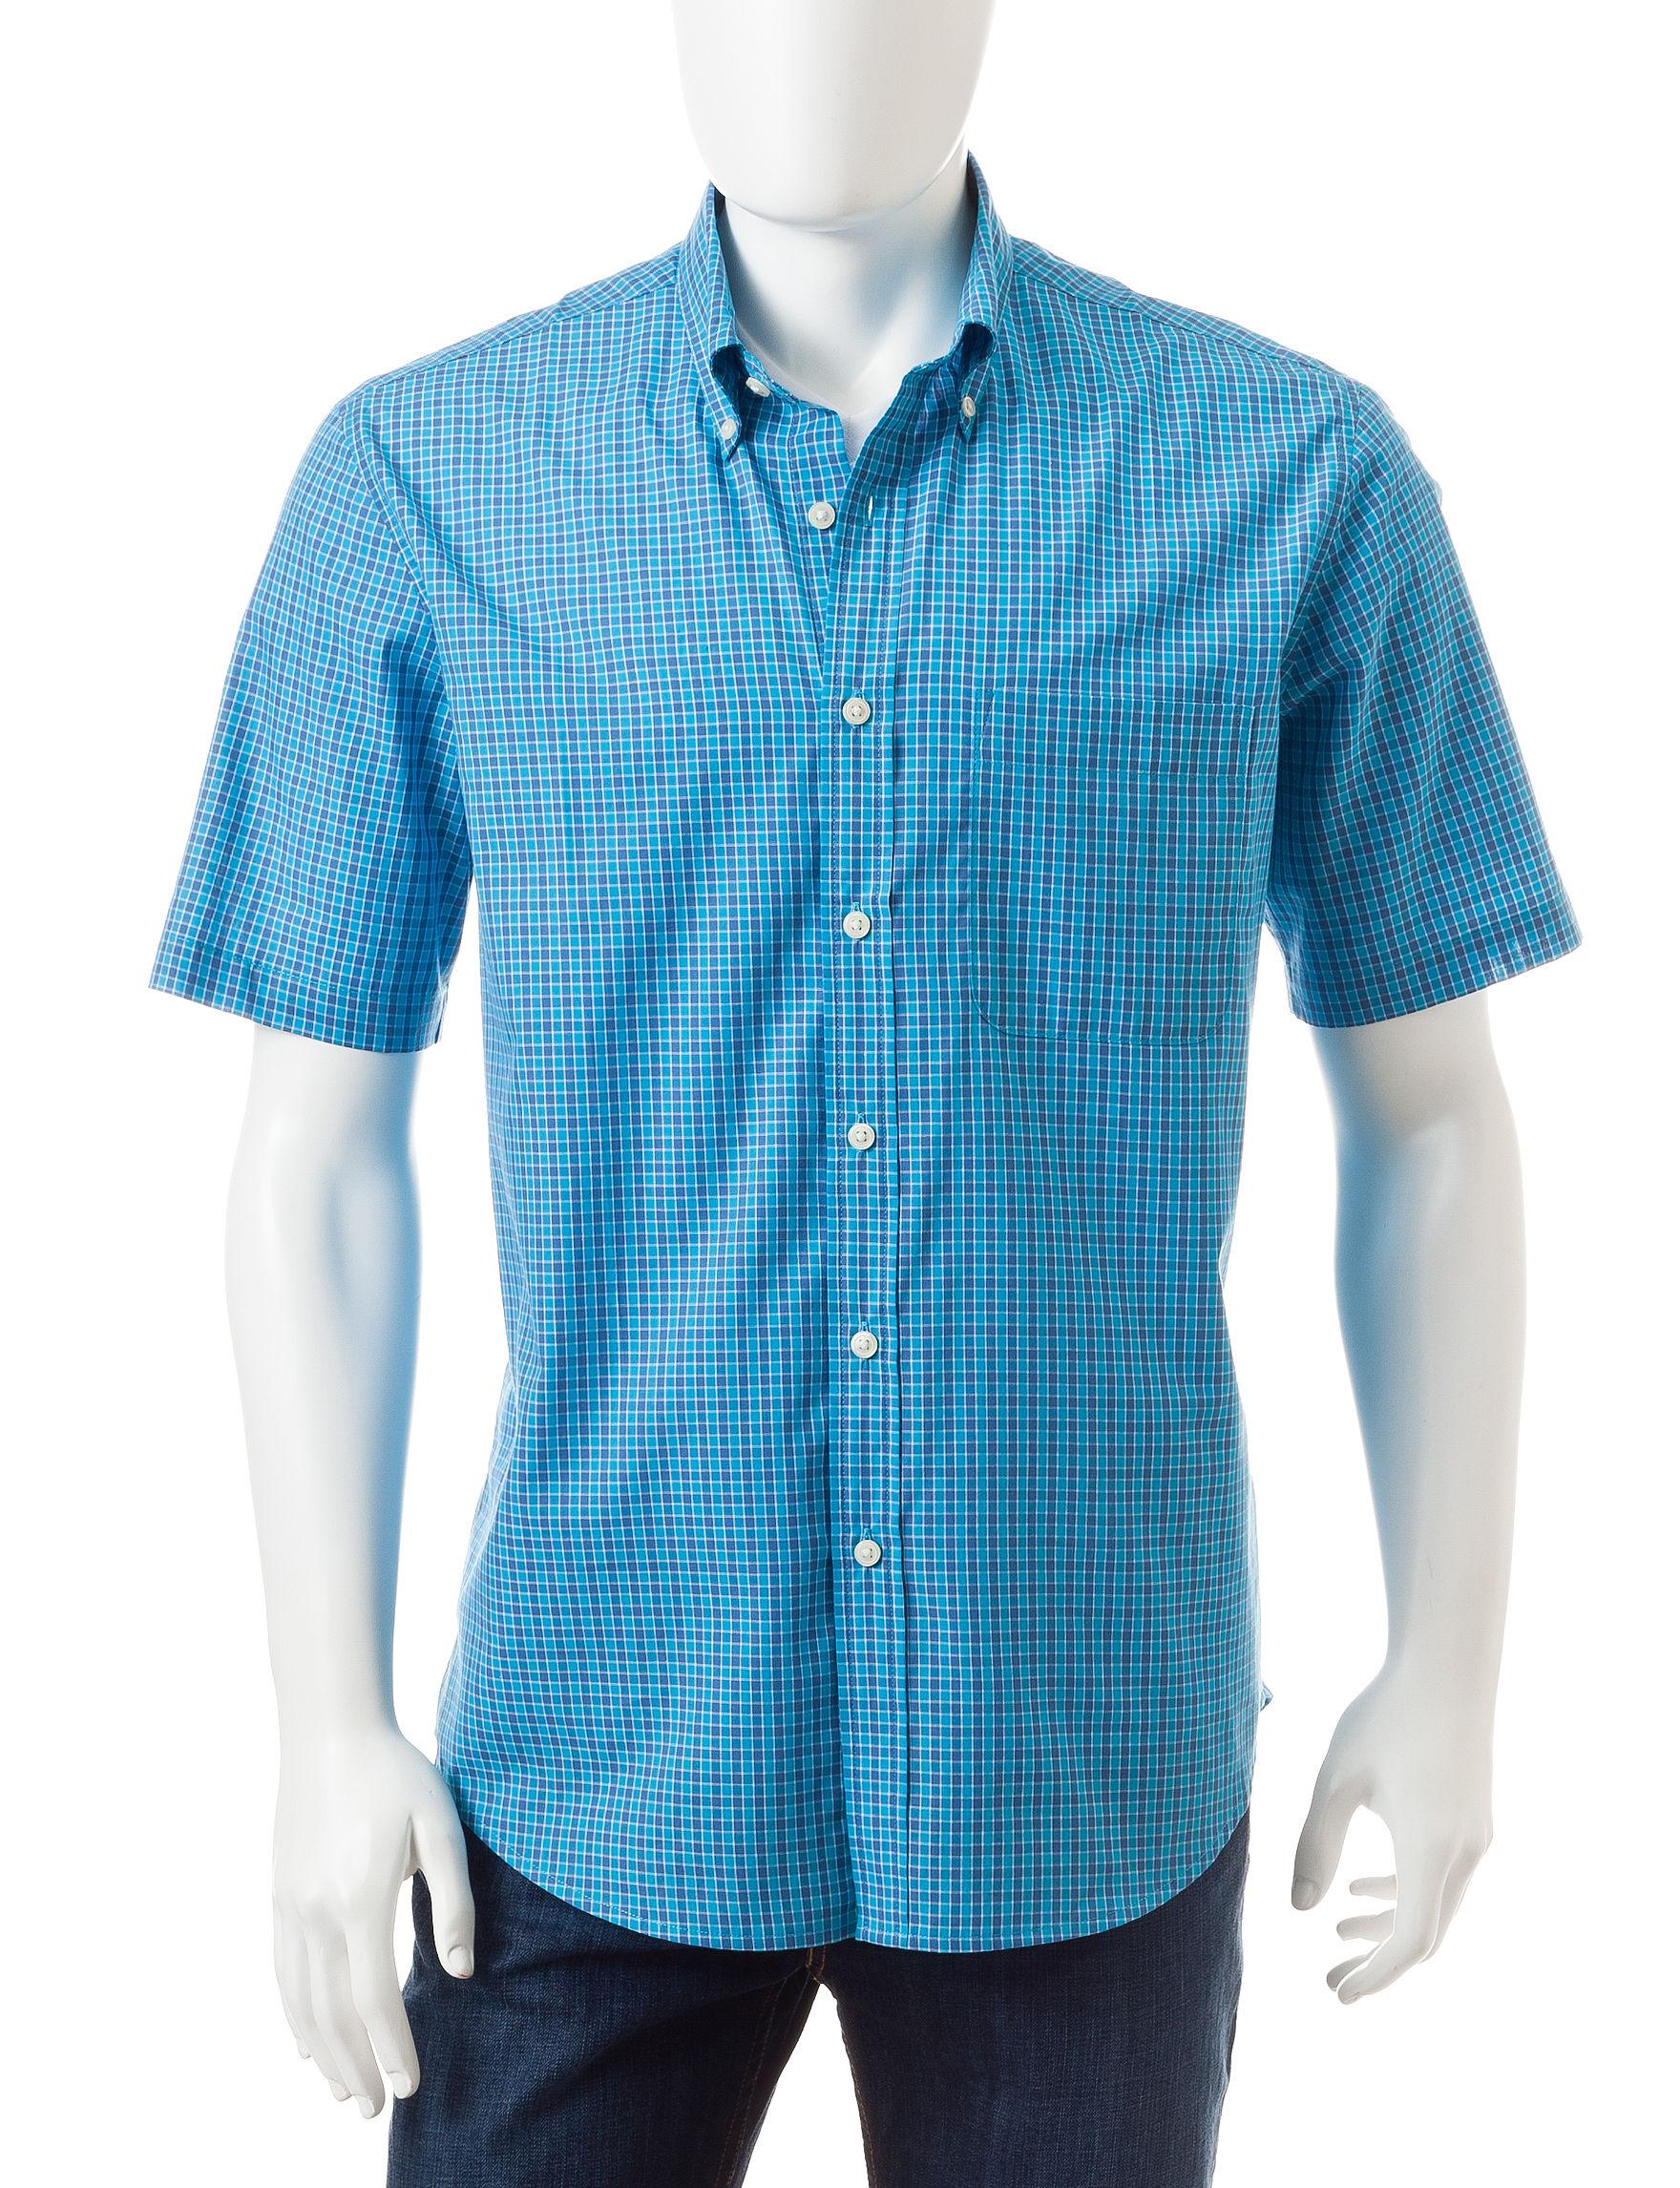 Sun River Delft Casual Button Down Shirts